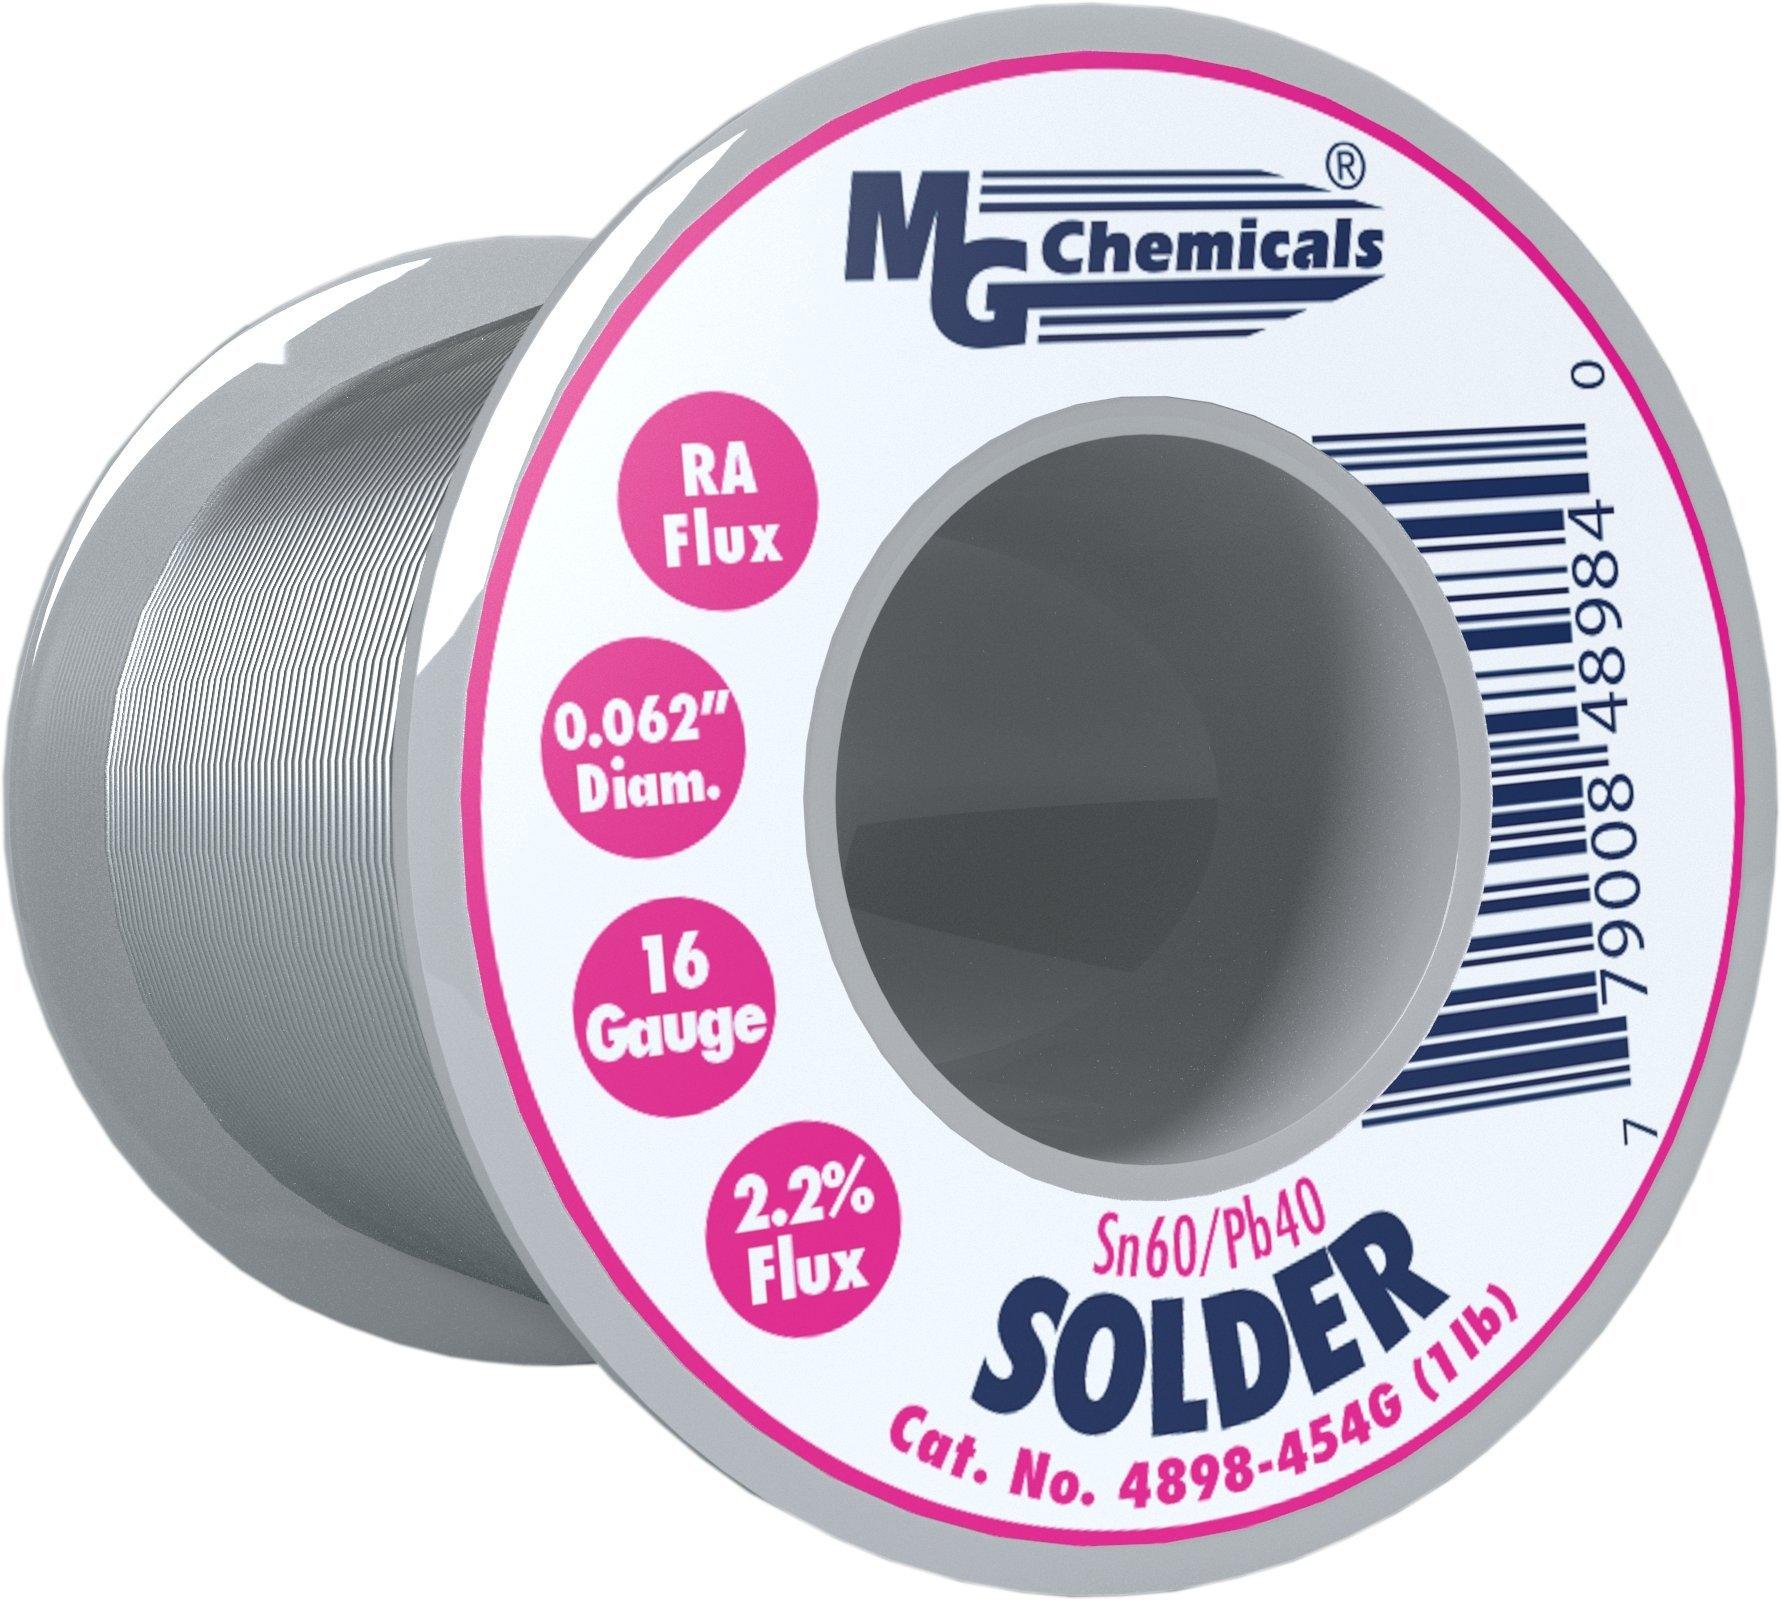 MG Chemicals 60/40 Rosin Core Leaded Solder, 0.062'' Diameter, 1 lbs Spool